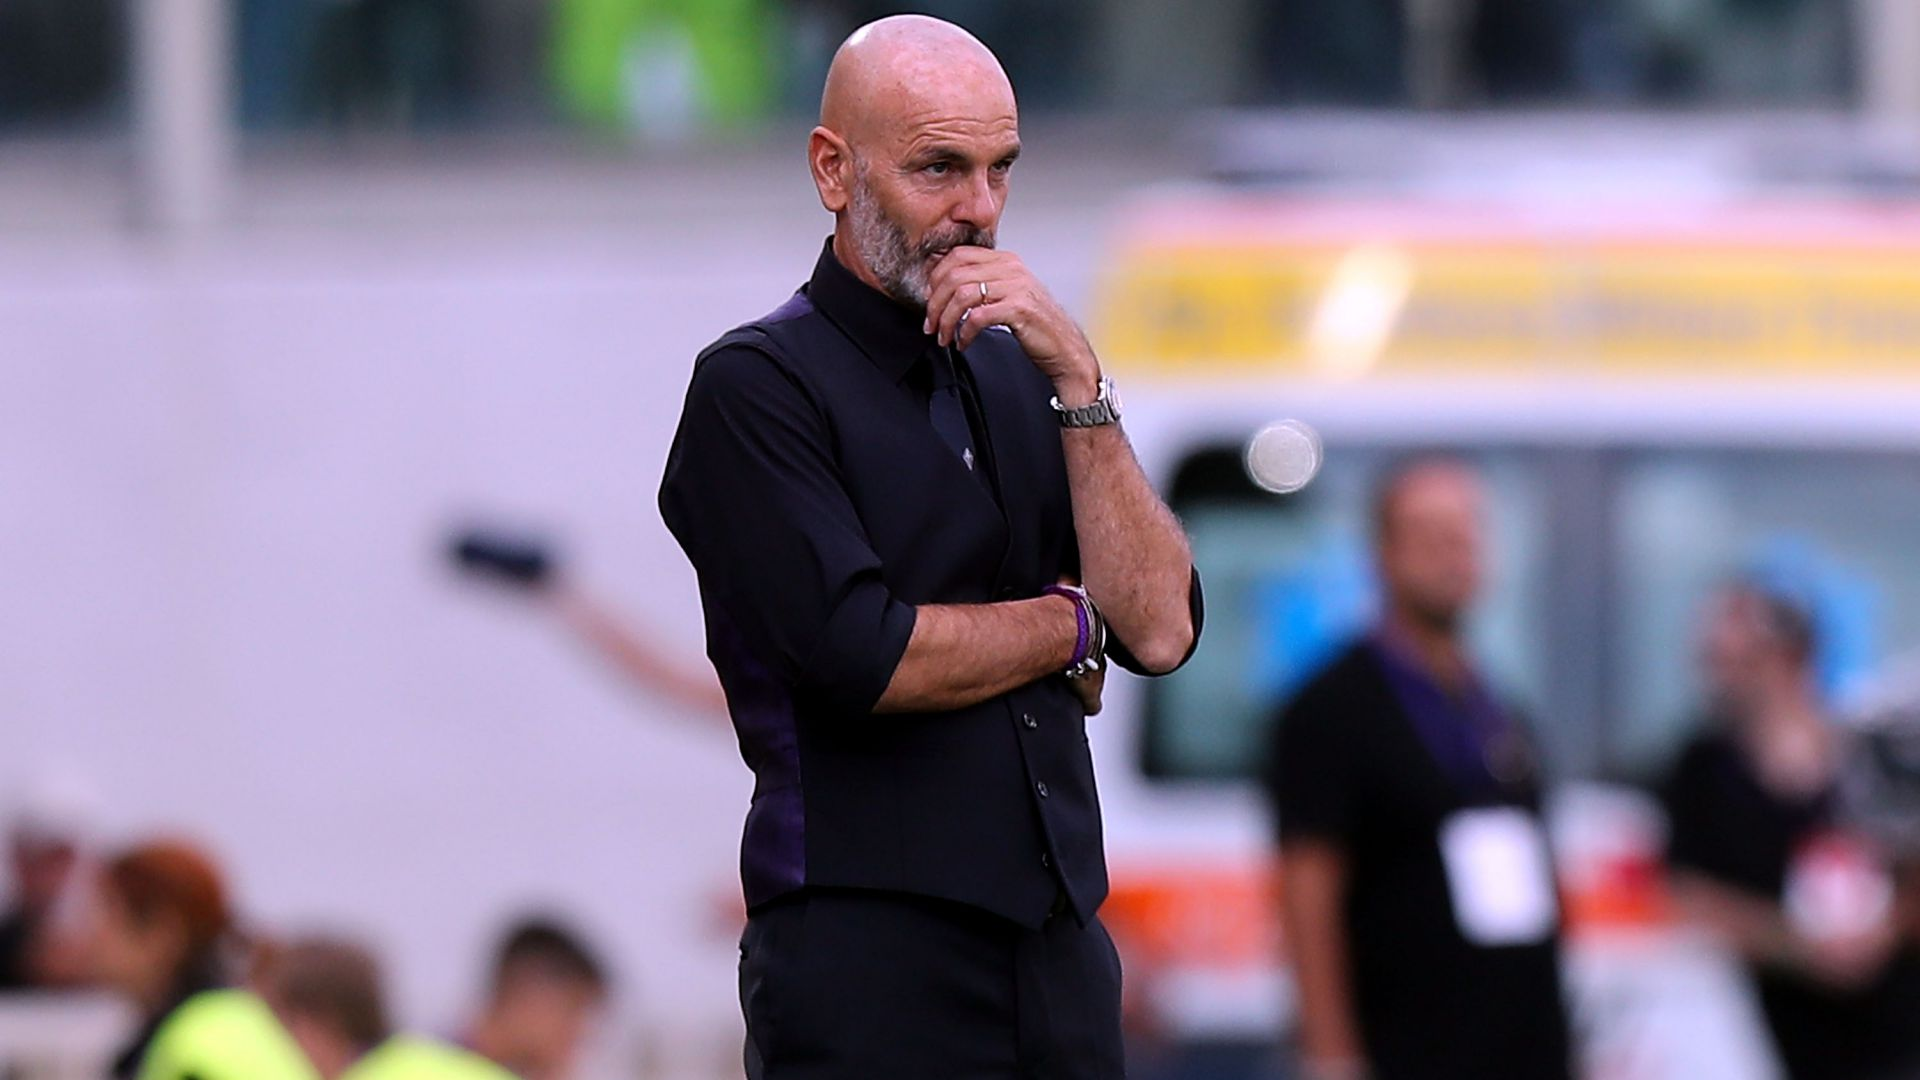 Stefano Pioli Fiorentina